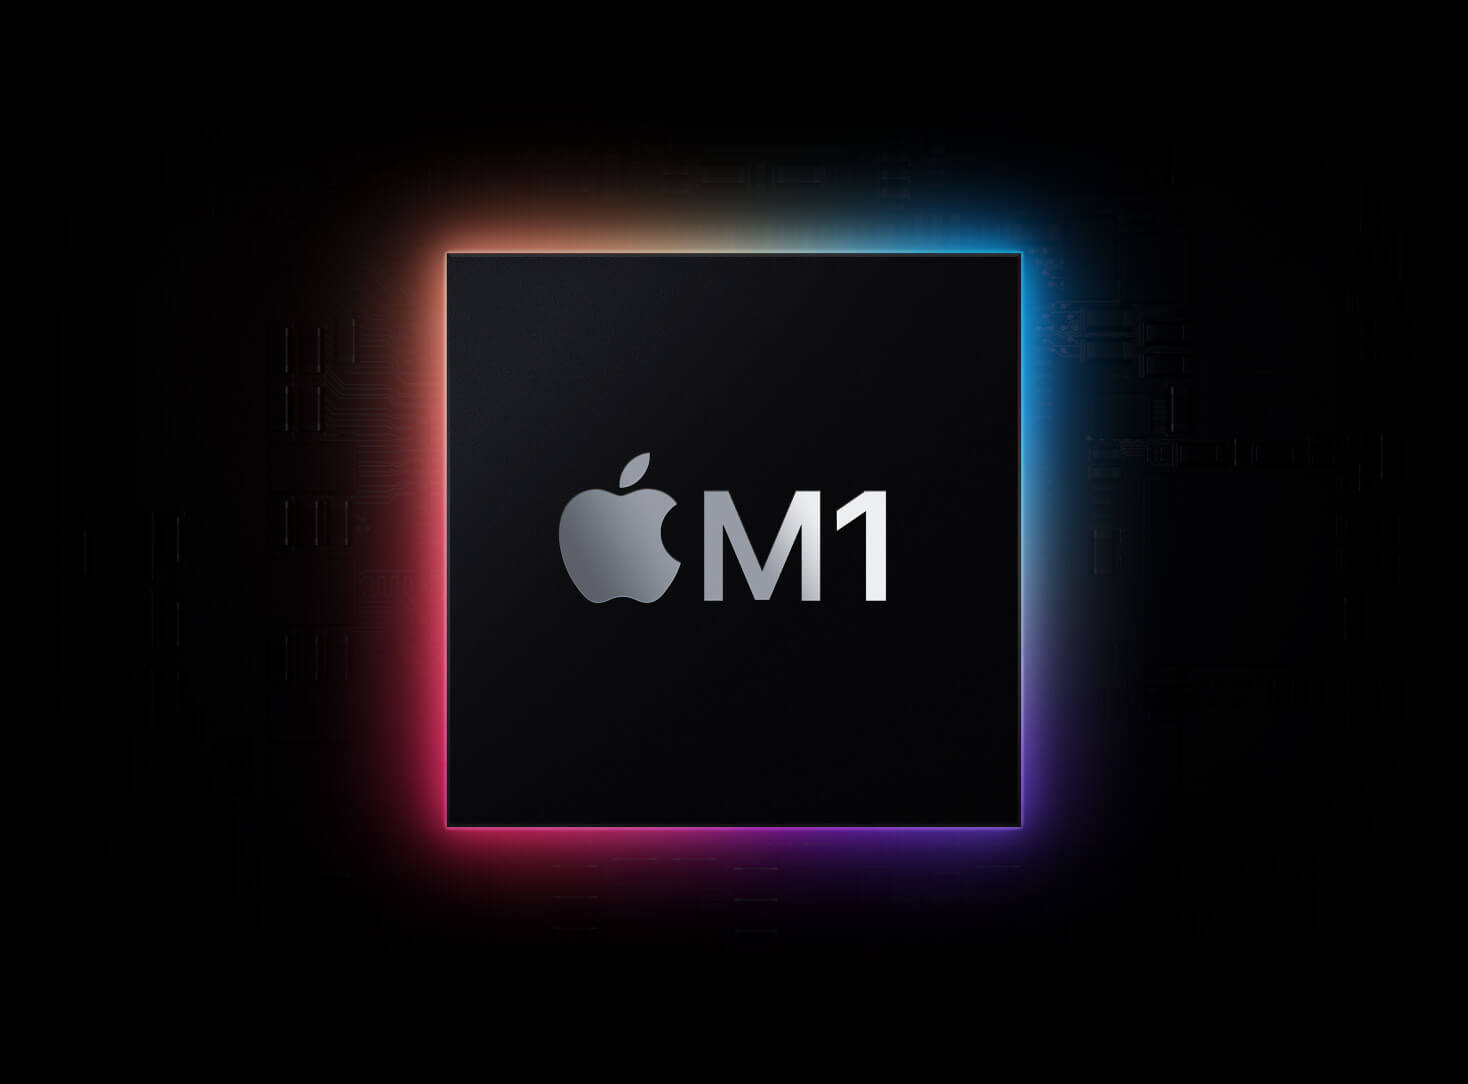 Apple Mac mini M1 chip leap